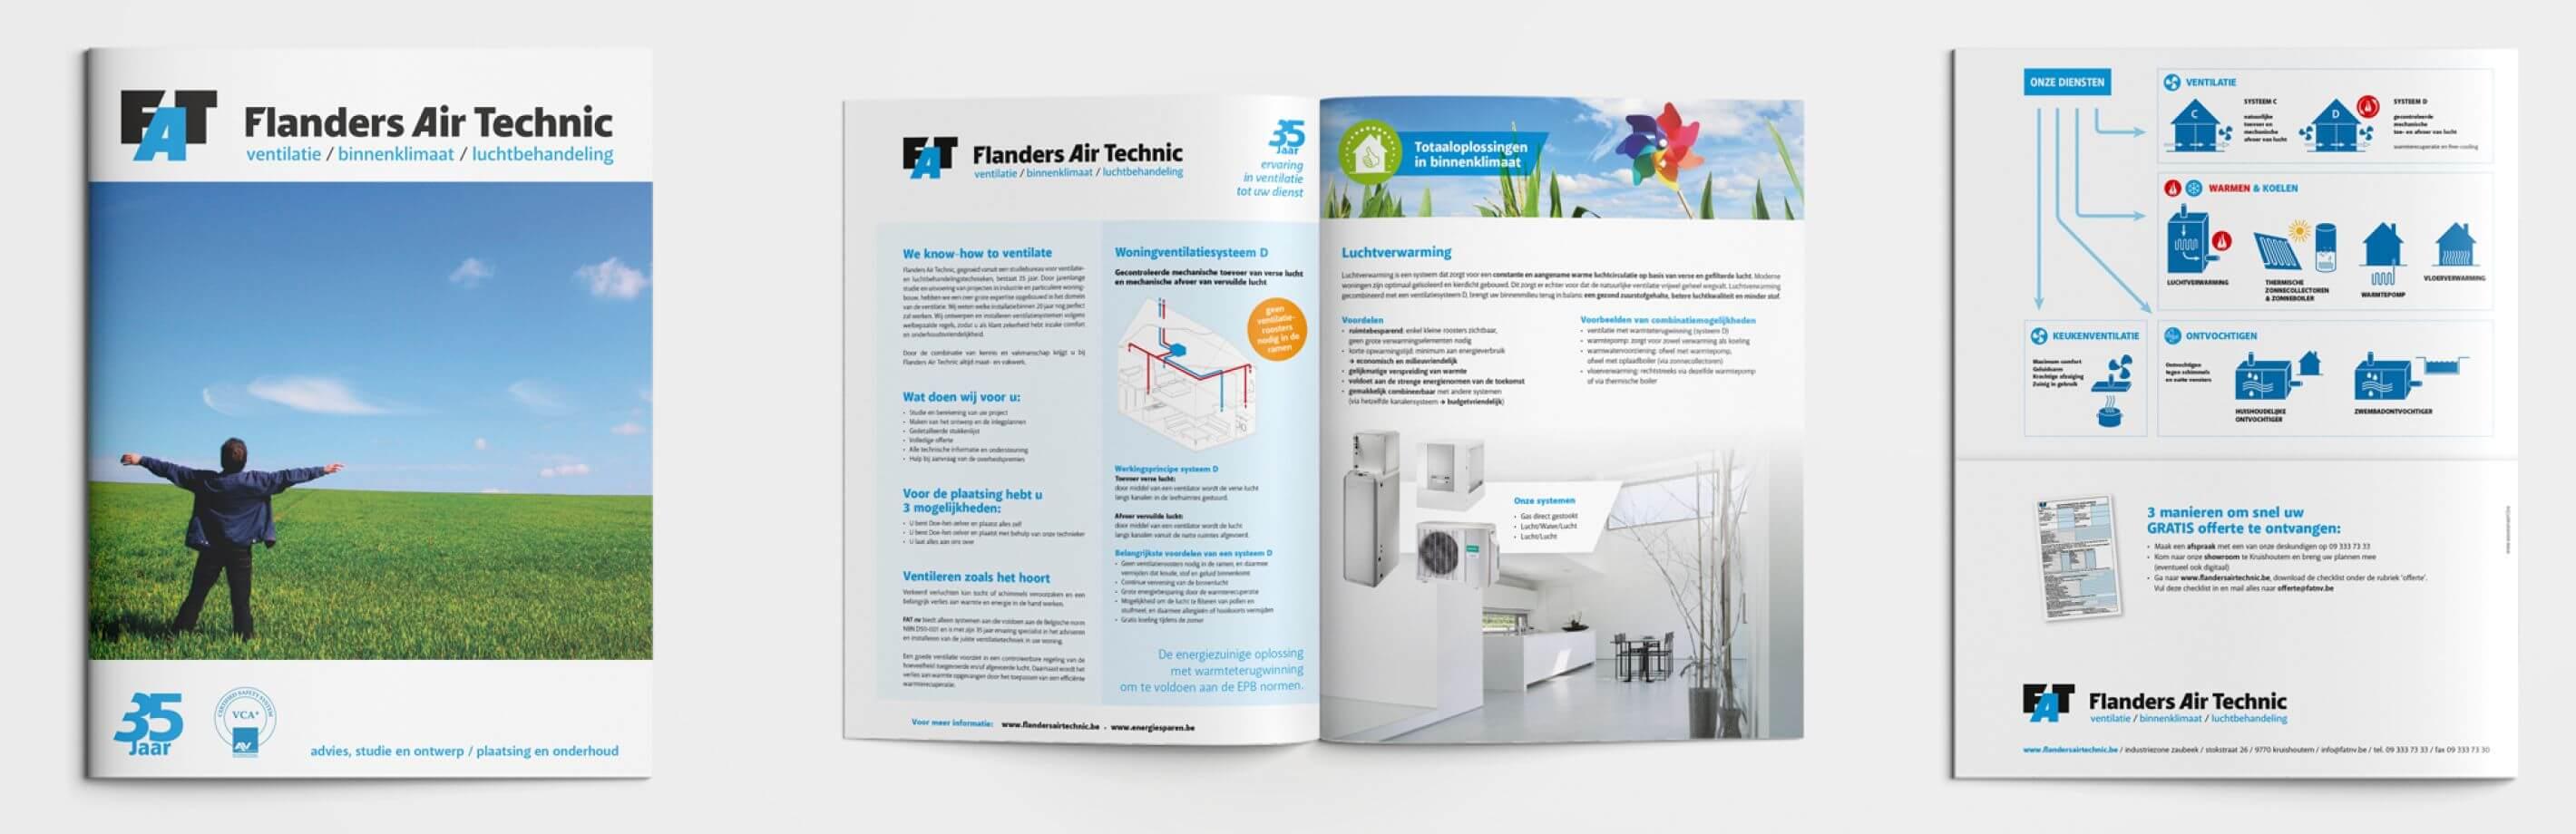 Flanders Air Technic Brochure